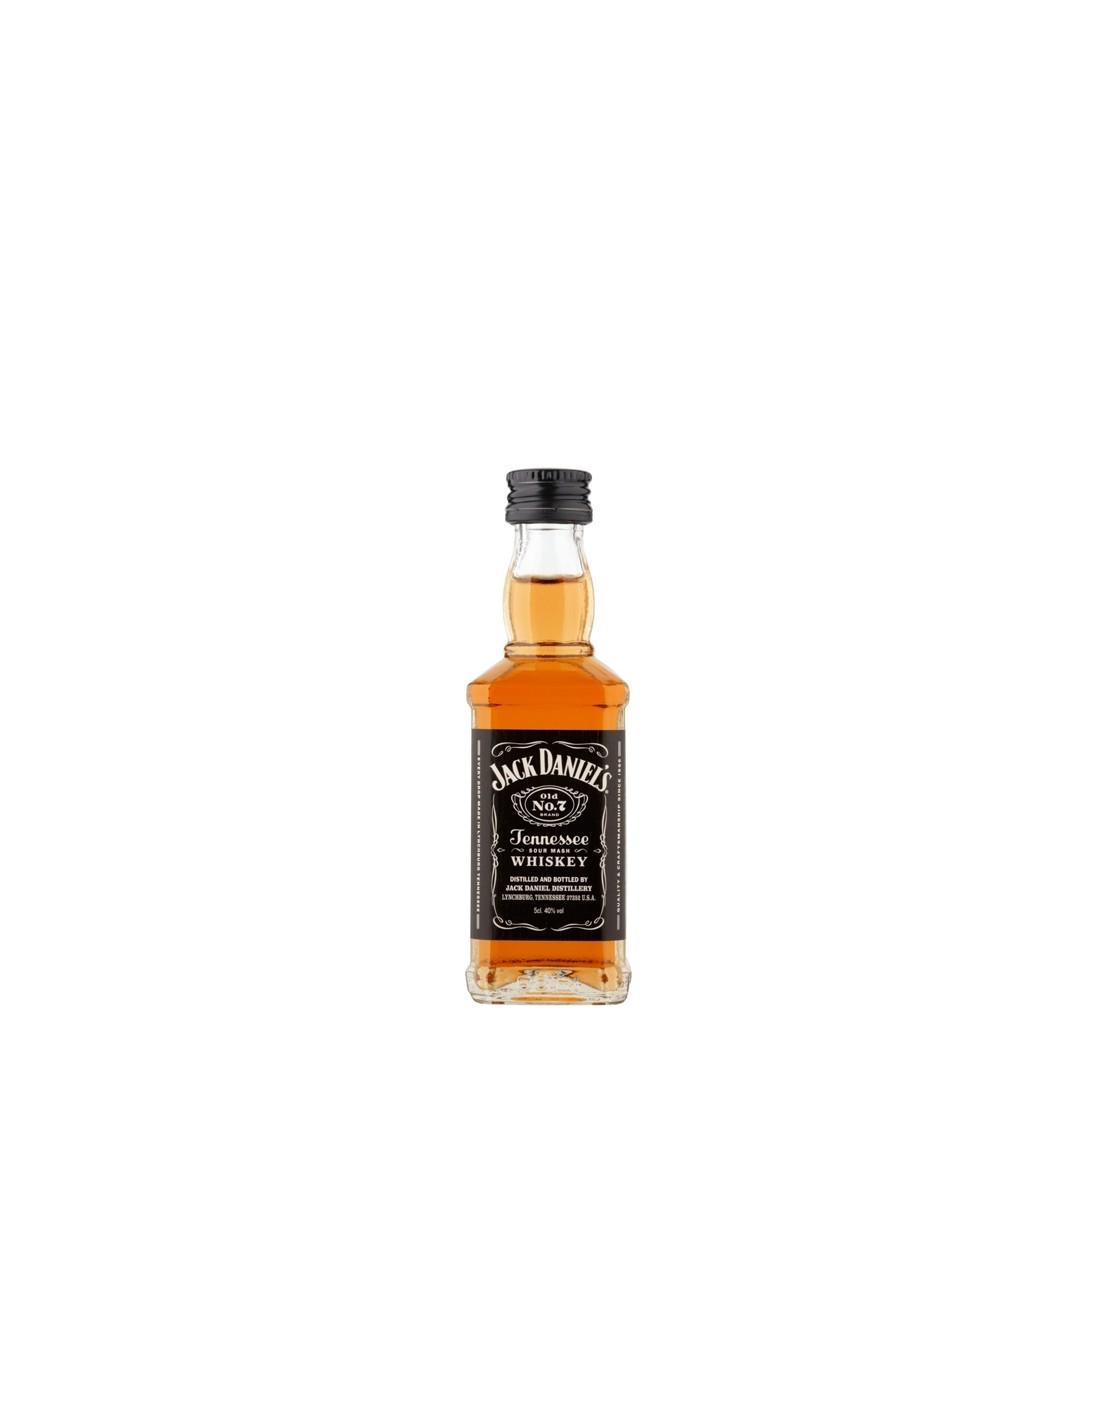 Whisky Bourbon Jack Daniel's, 40% alc., 0.05L, America